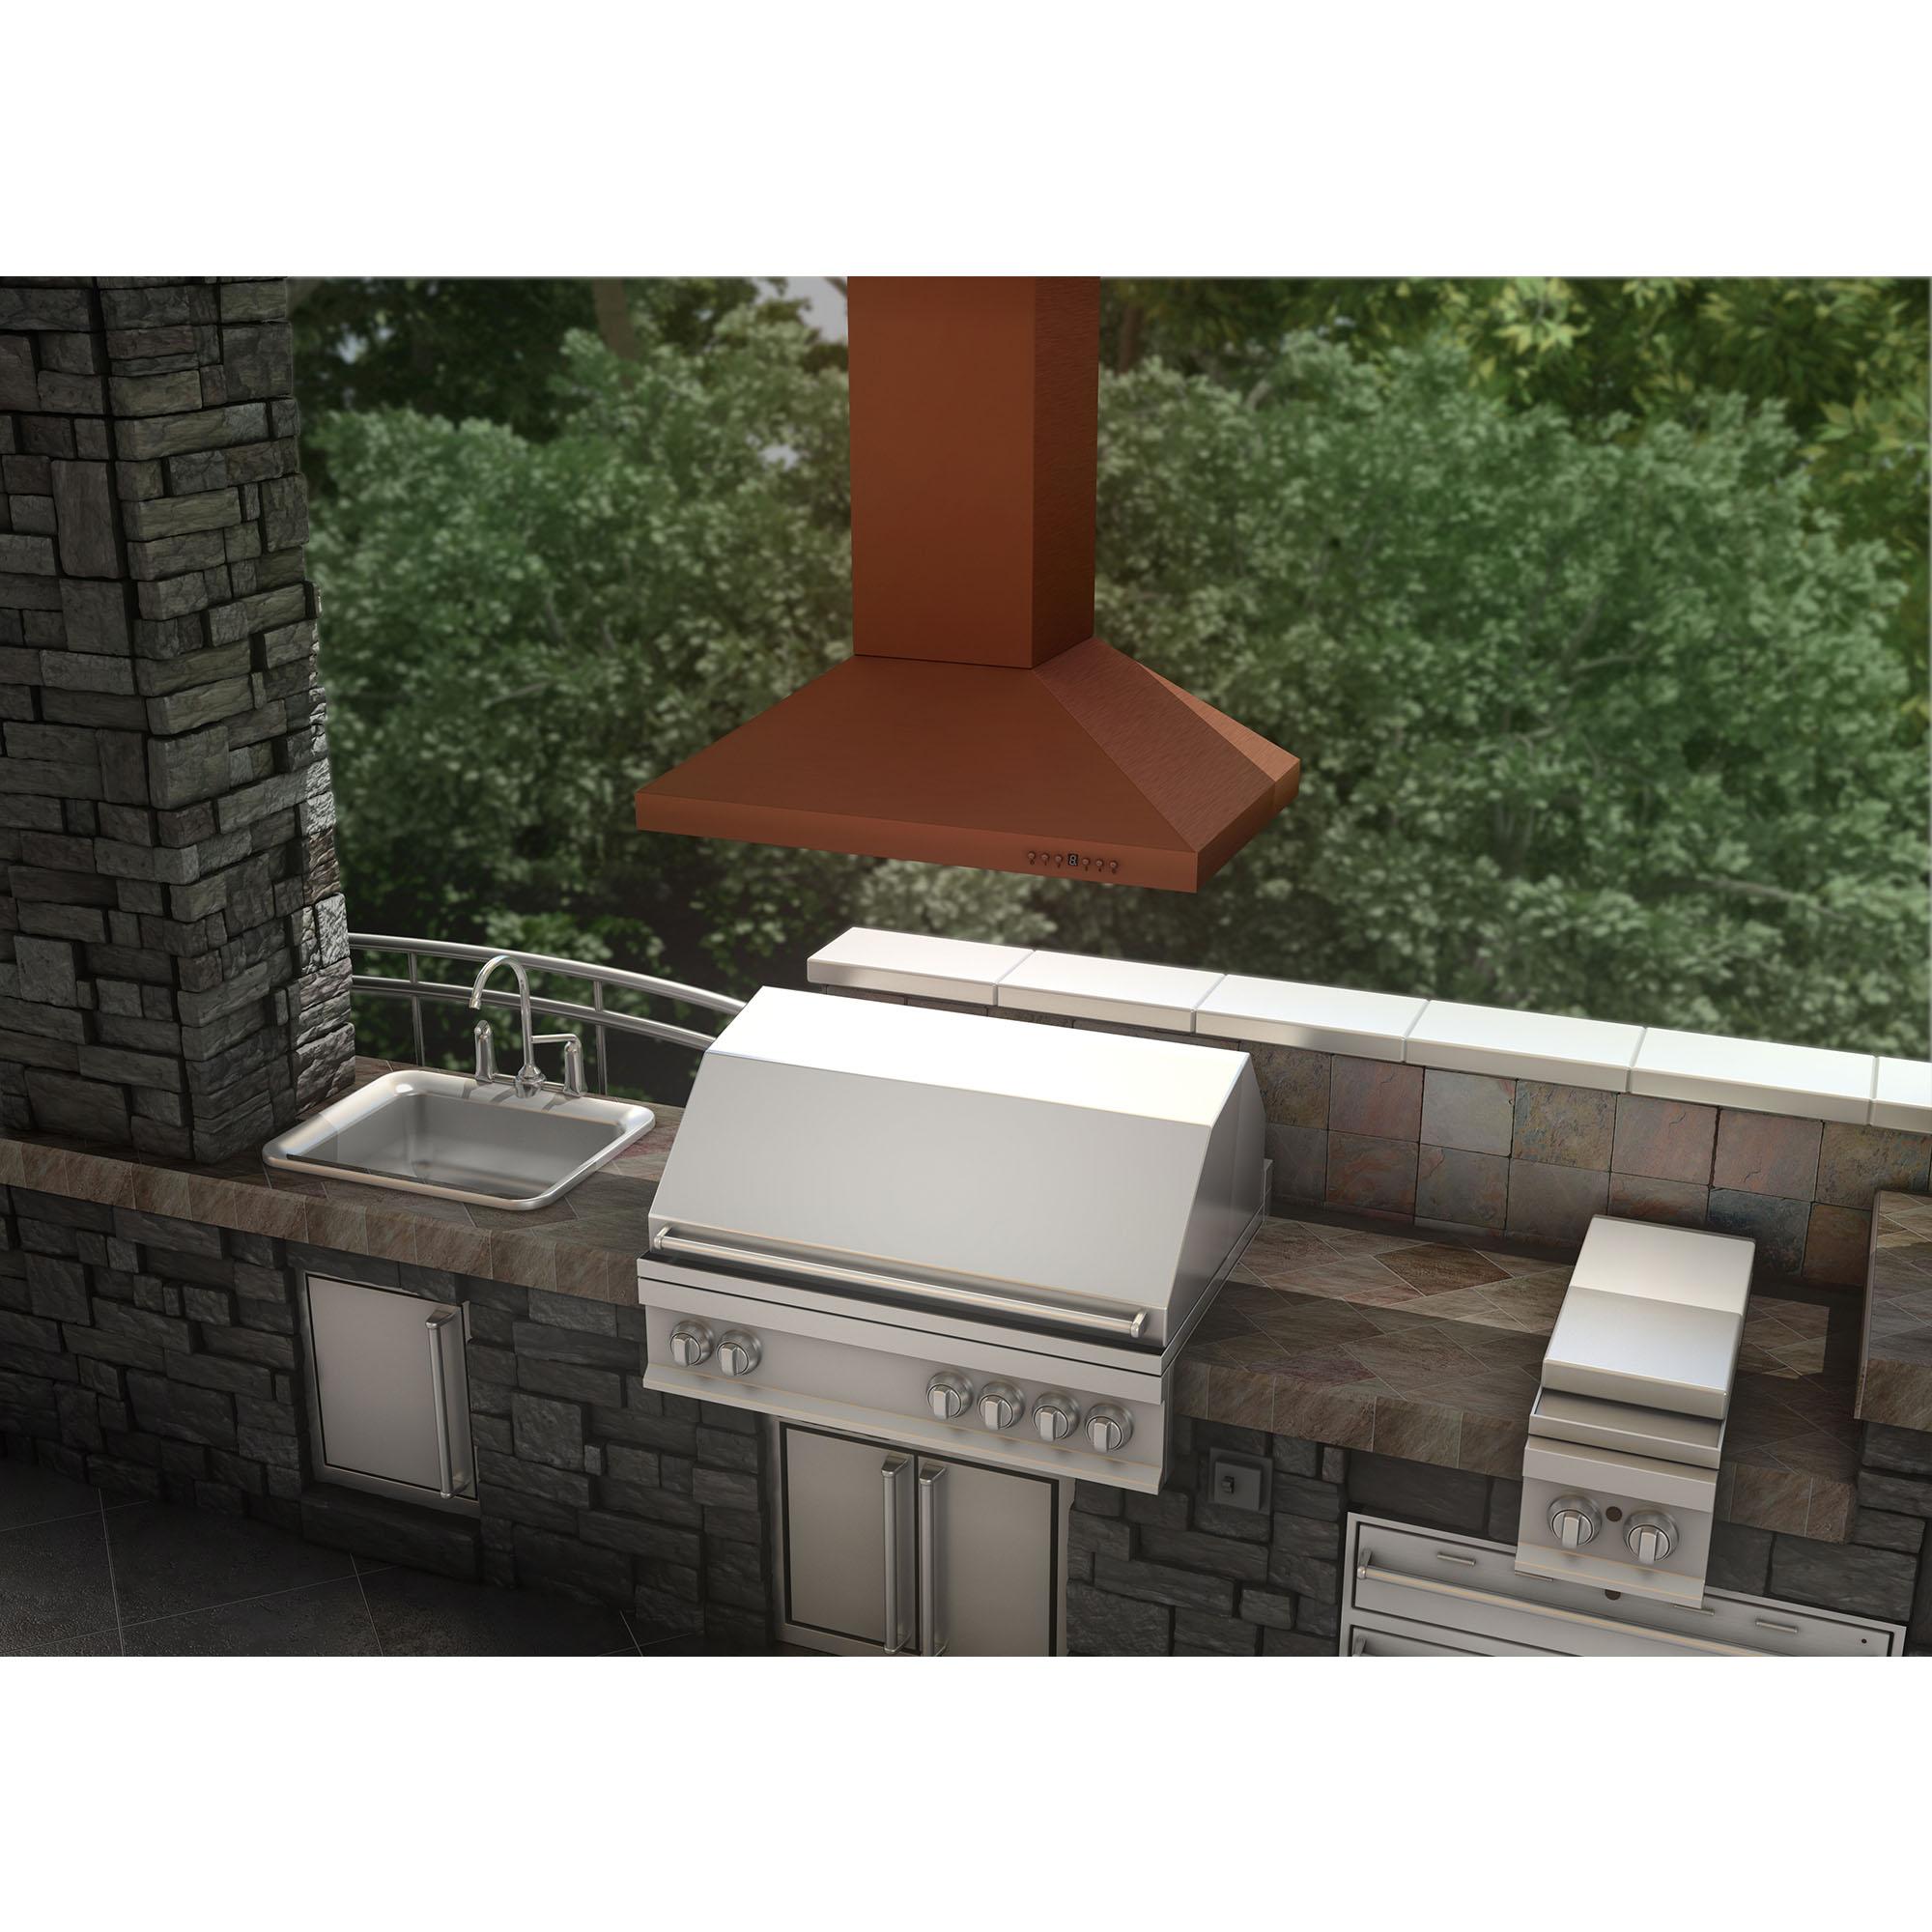 New_Copper_Island_Hood_New_Outdoor_Kitchen_Cam_02_RE.jpg